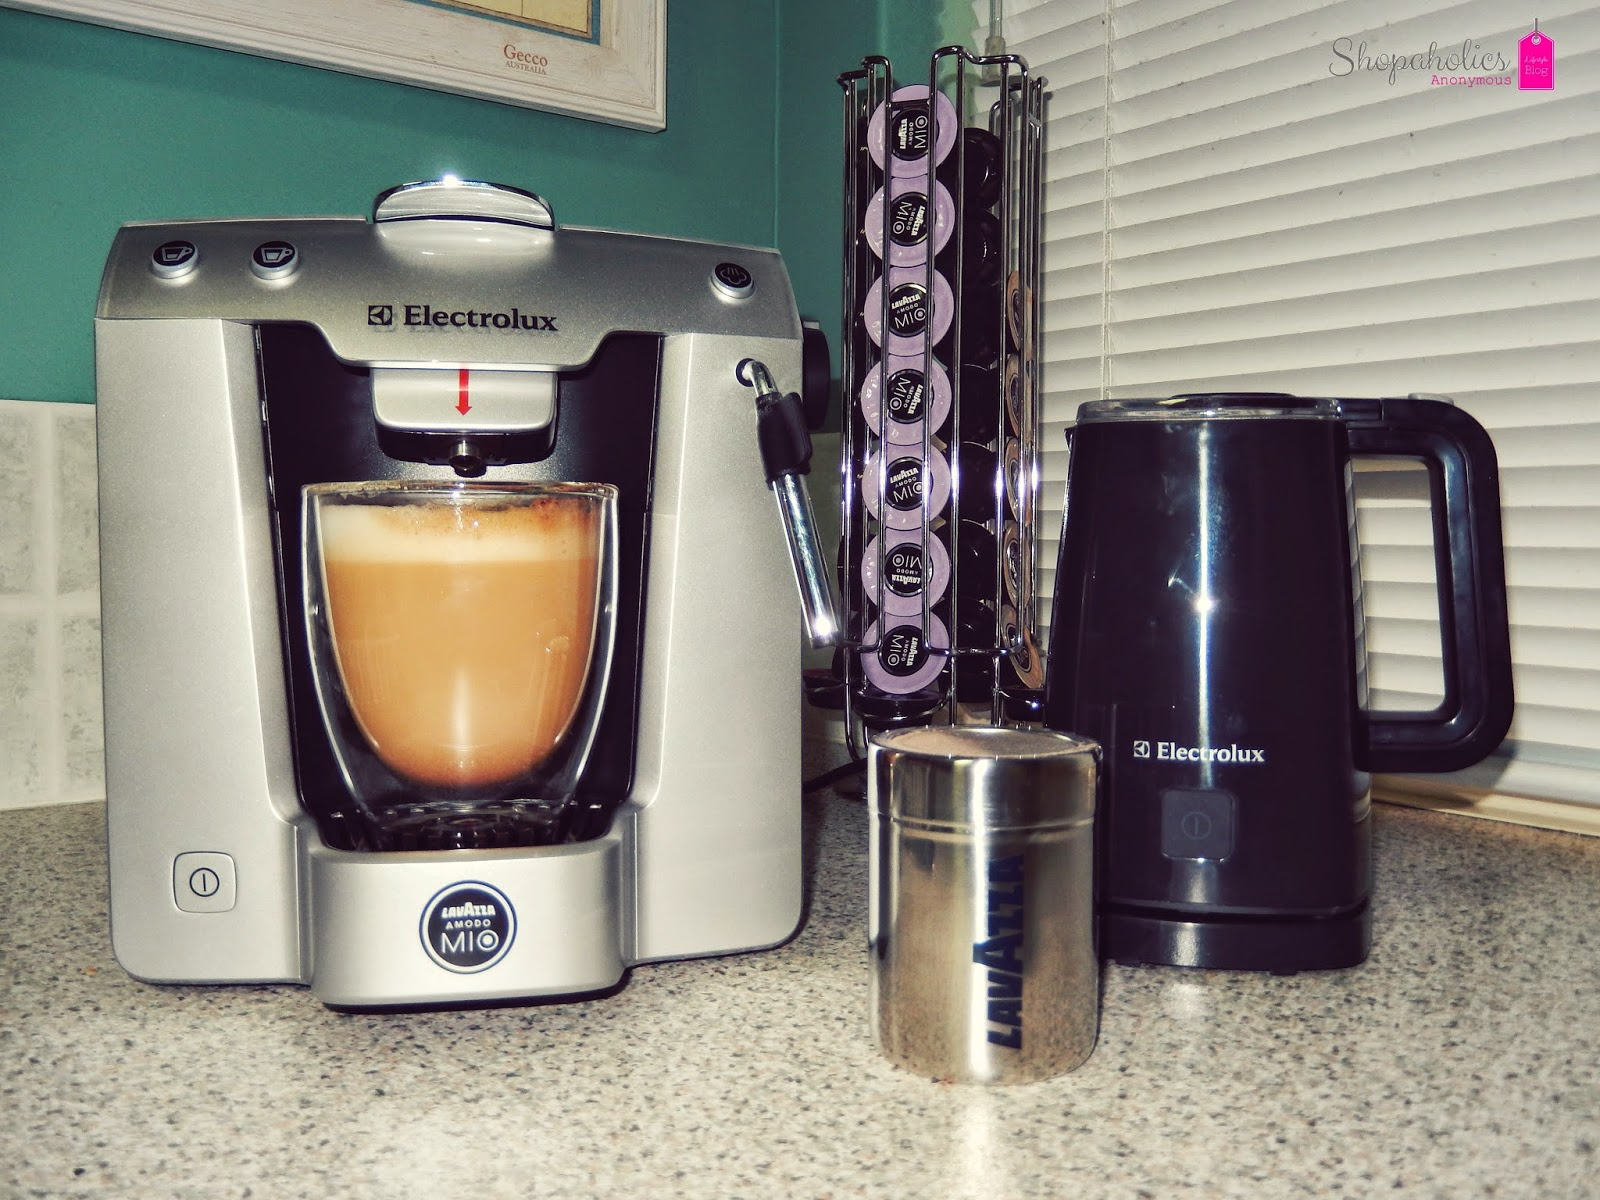 Lavazza Coffee Maker Instructions : Lavazza Coffee Machine Review* Shopaholics Anonymous Blog